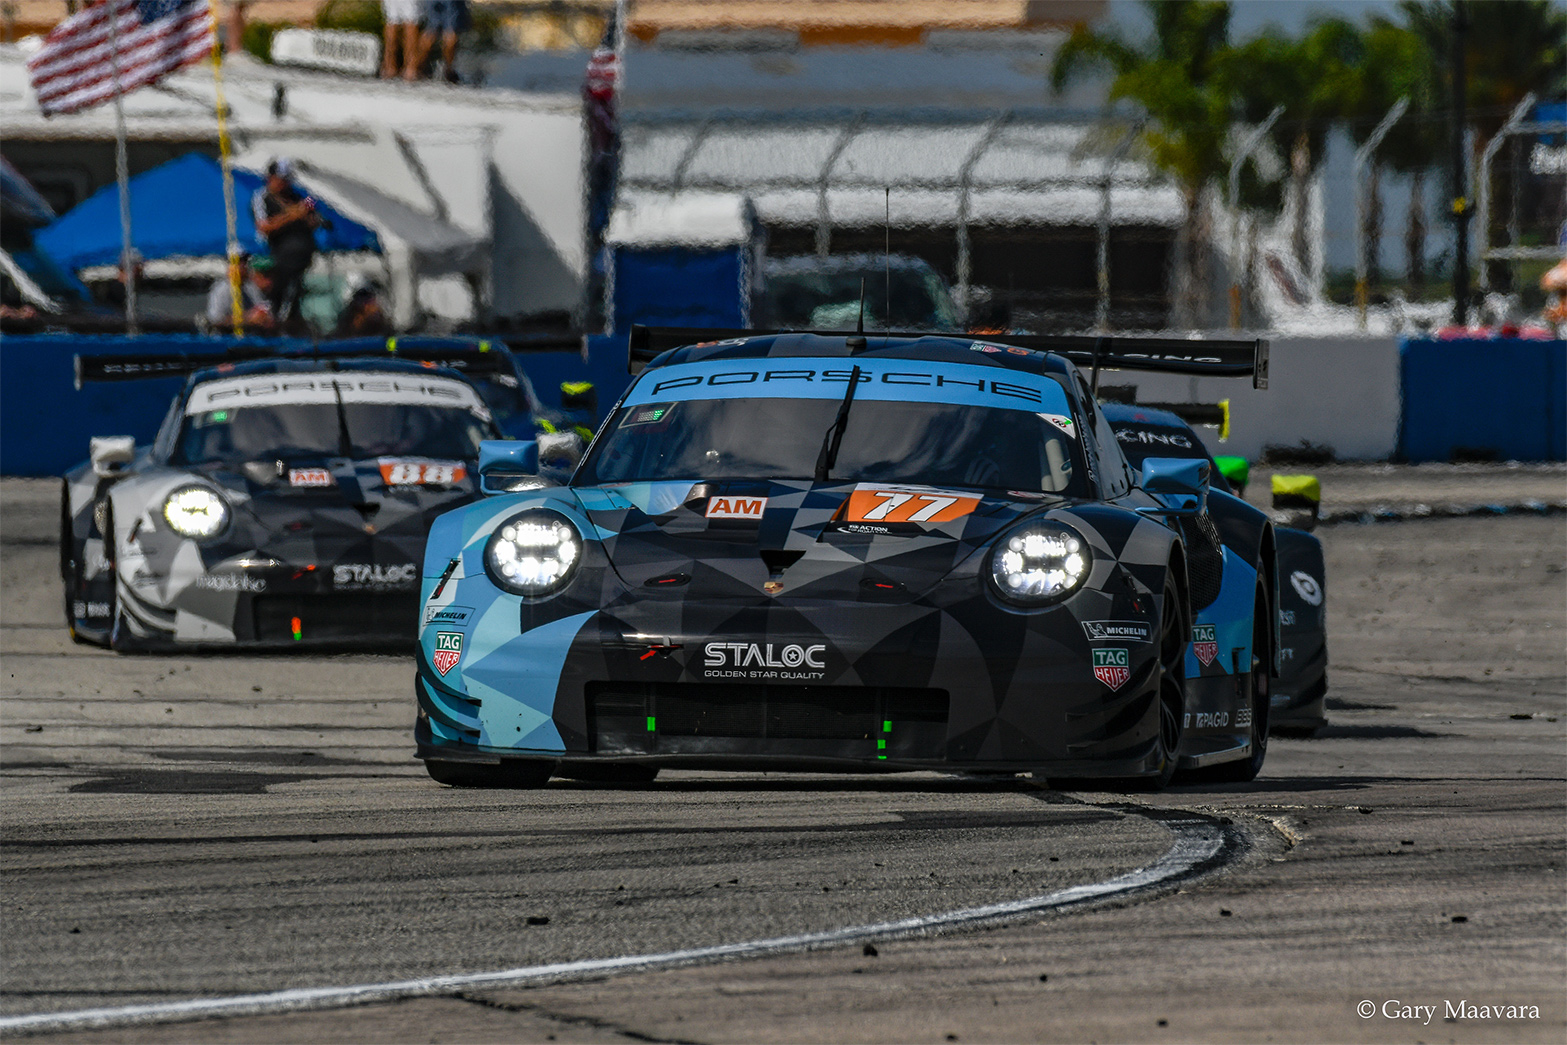 TrackWorthy - FIA WEC_race_hour one_#77_Porsche 911 RSR_ lap one